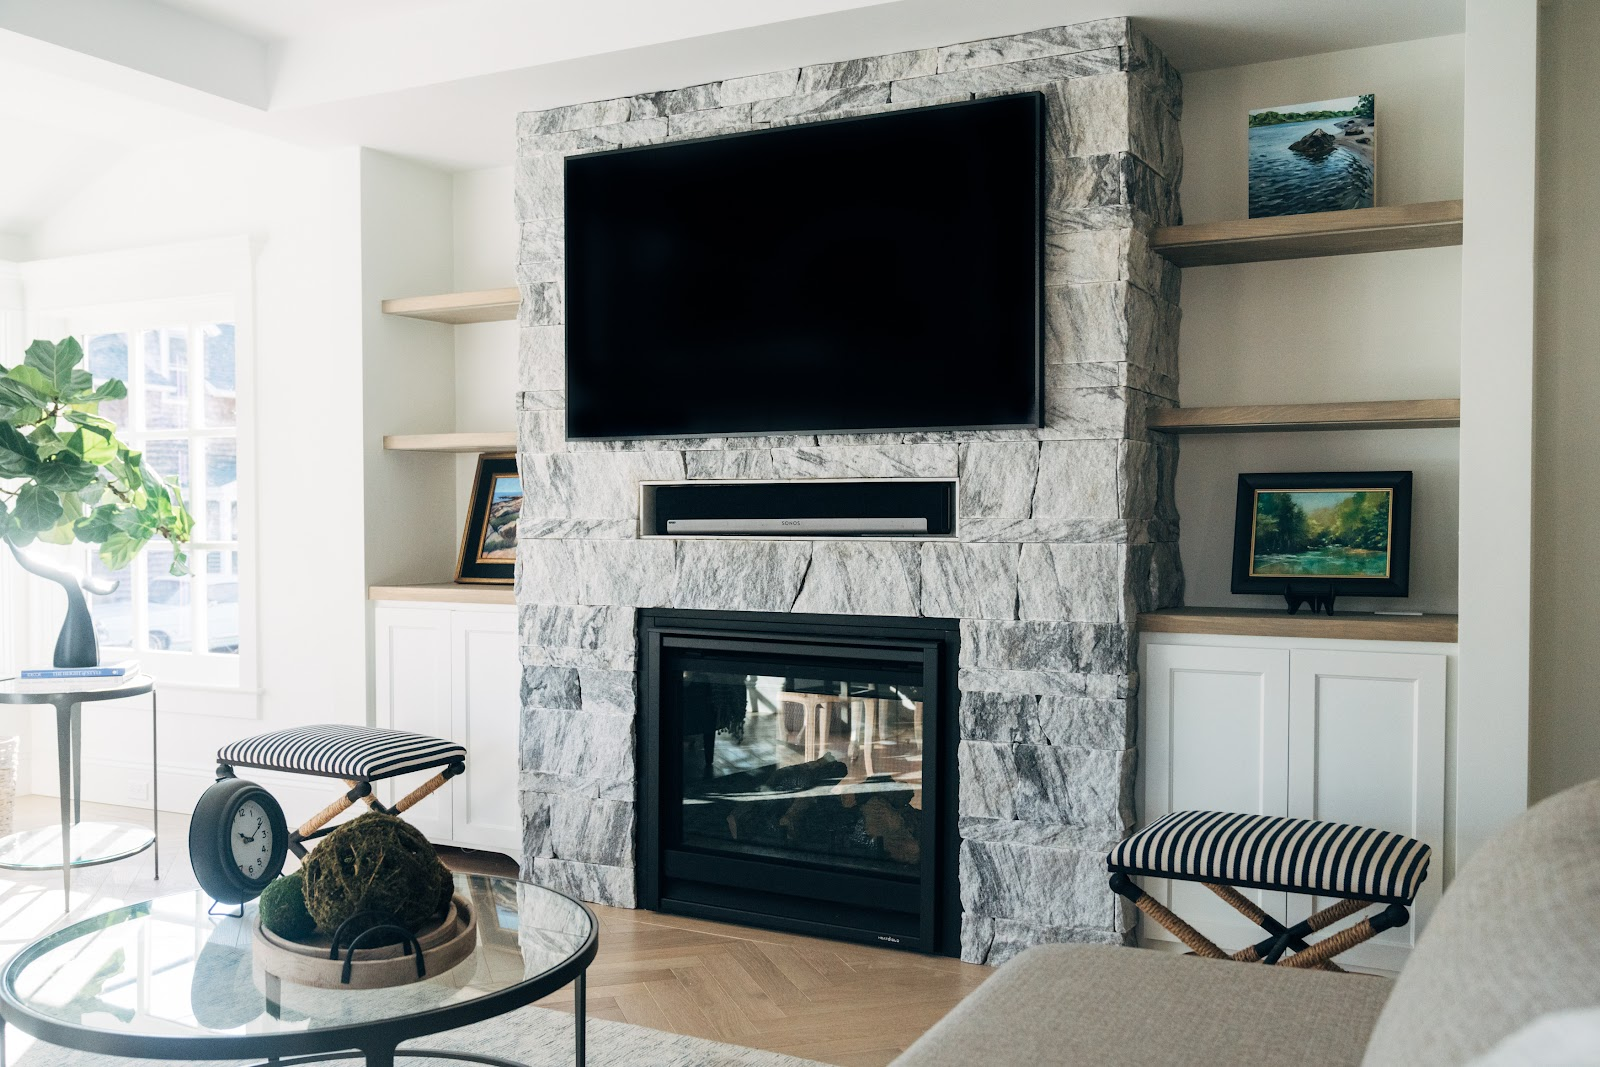 Indoor fireplace clad in Pearl Grey marble veneer